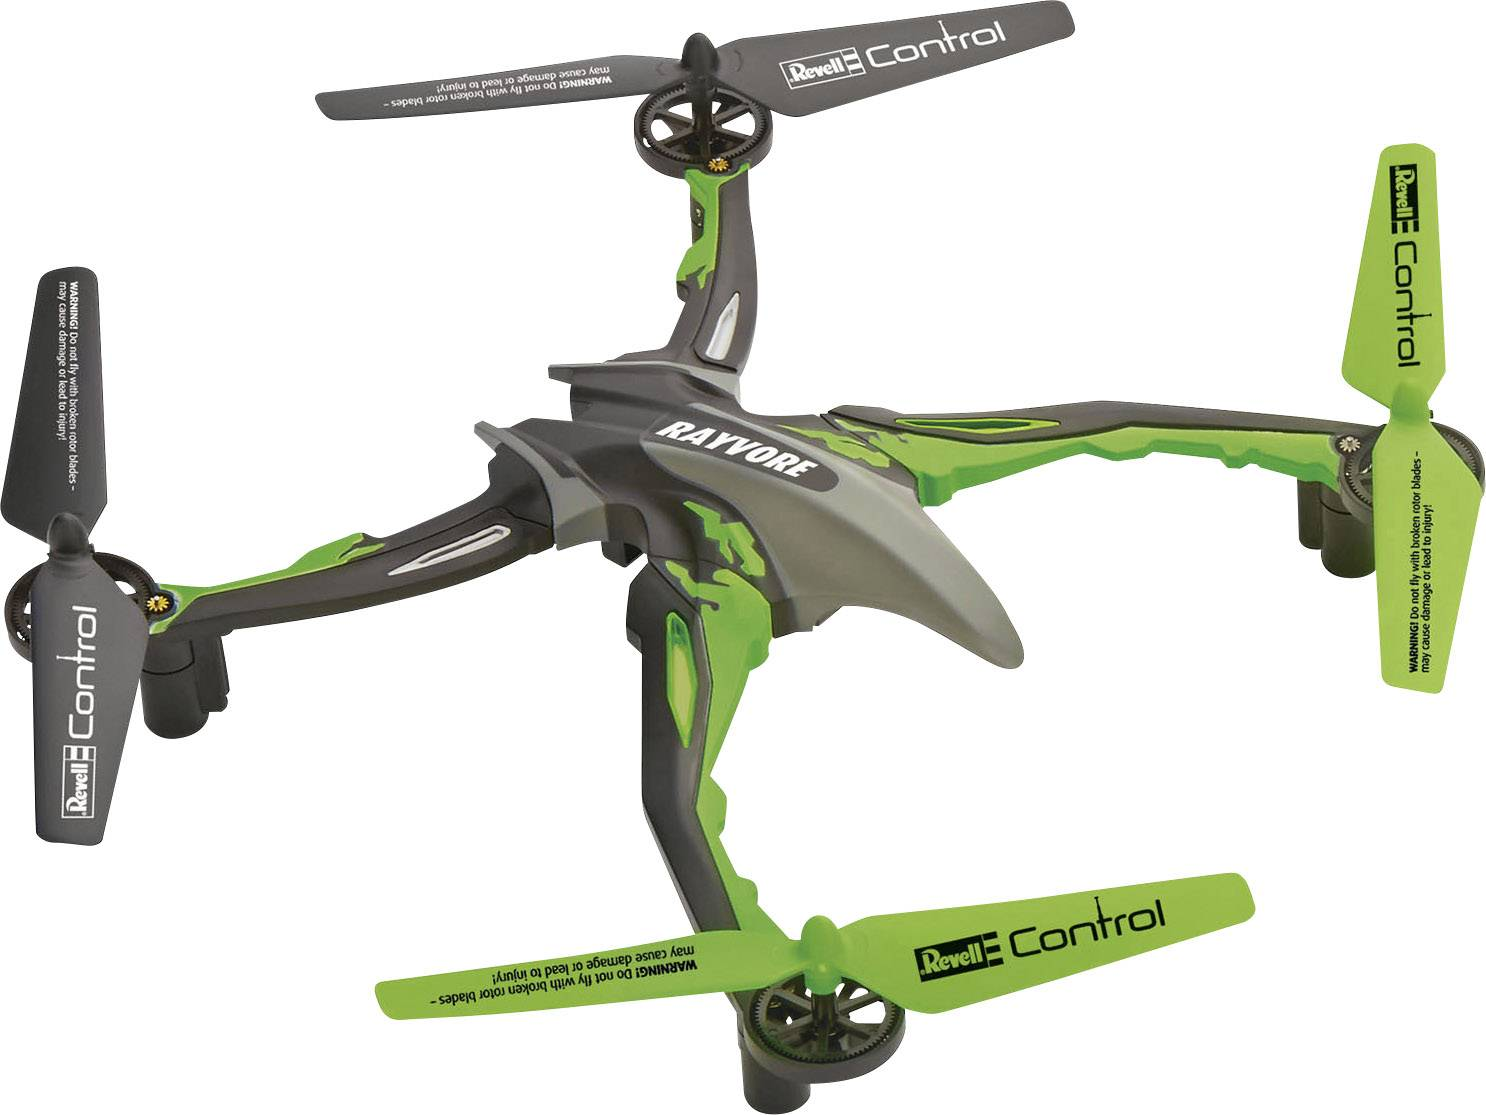 Revell Rayvore Quadrocopter